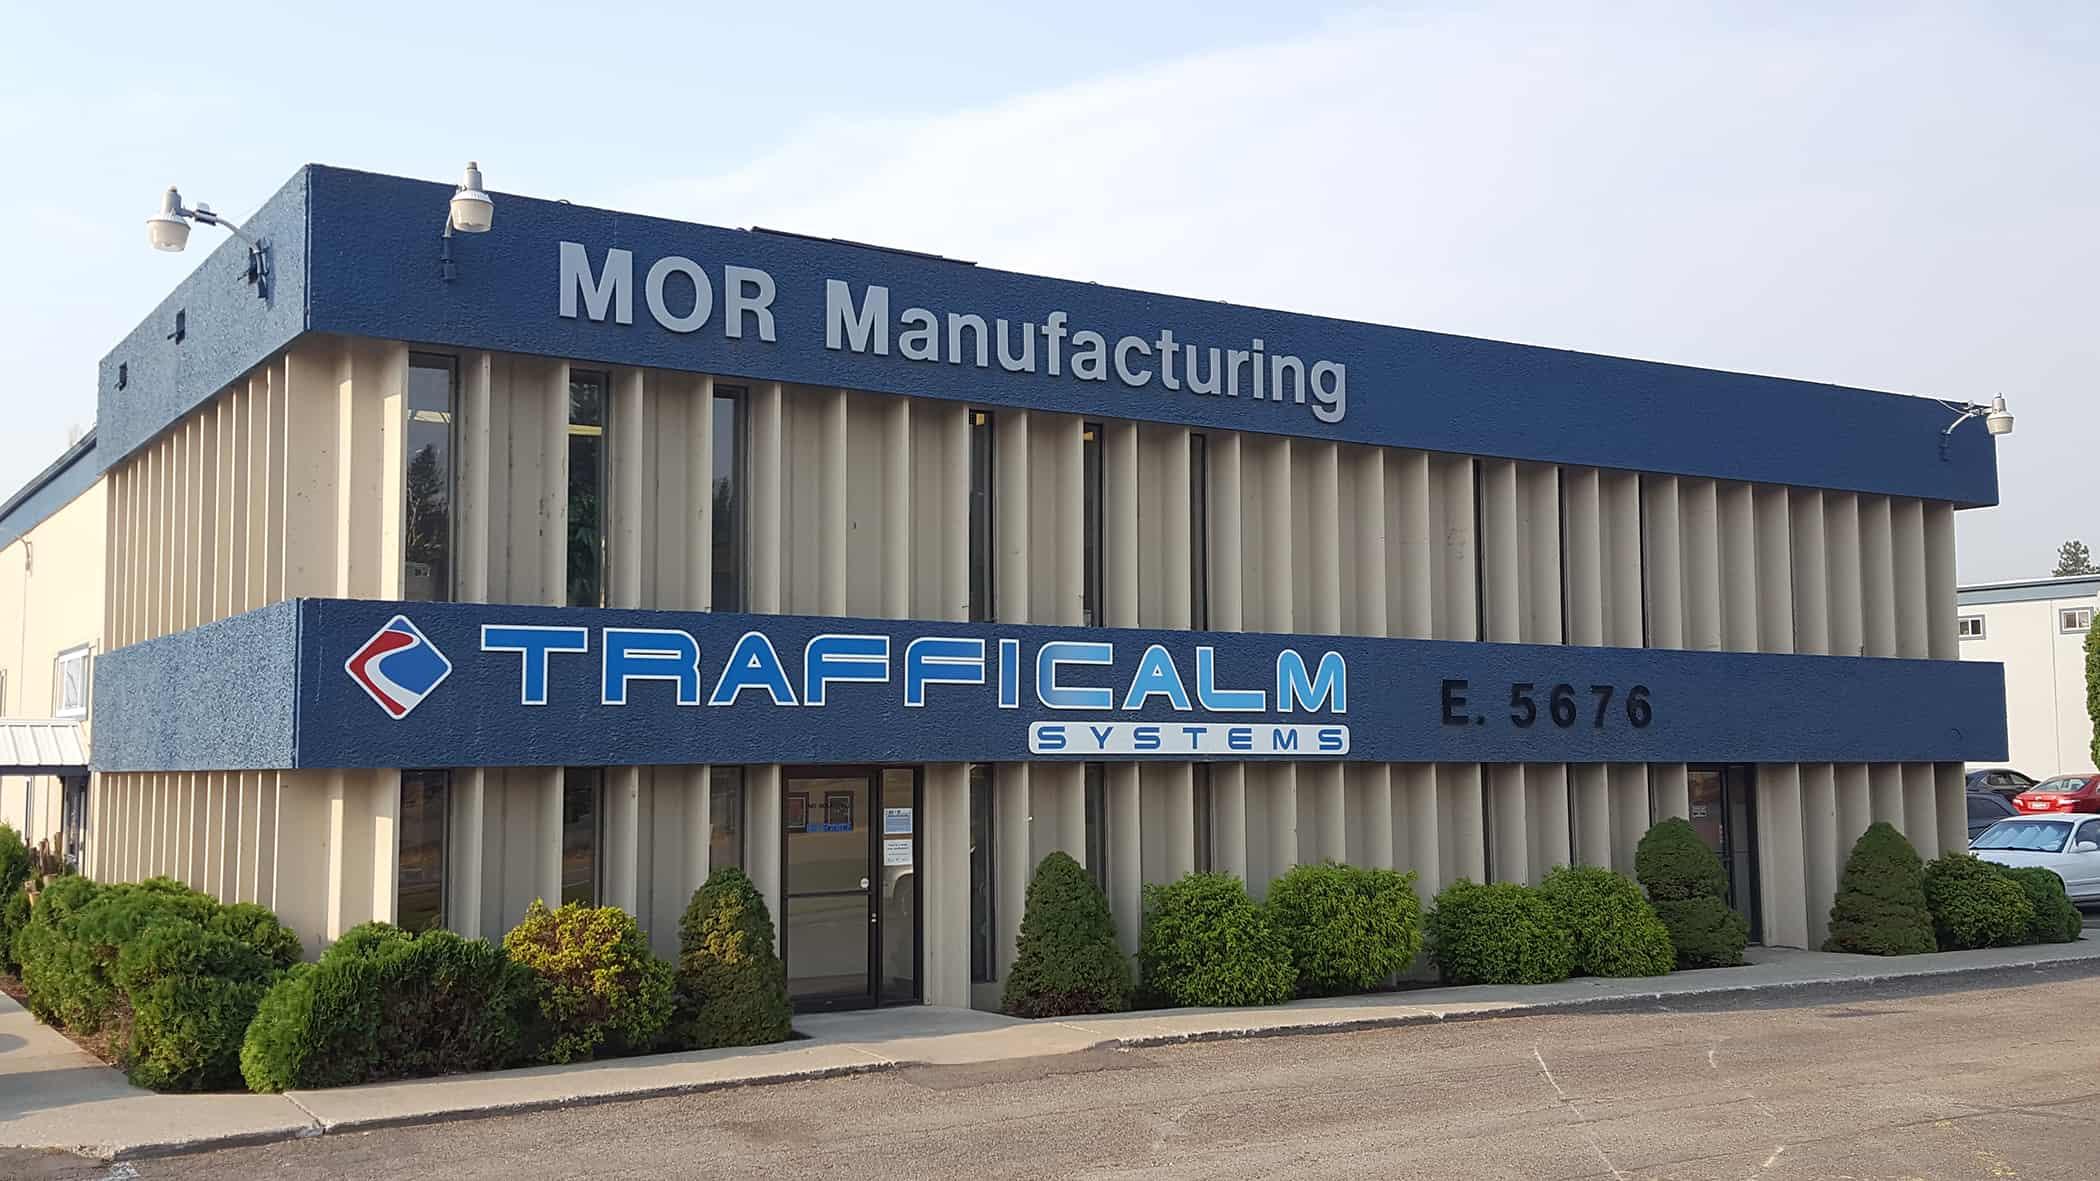 TraffiCalm Building